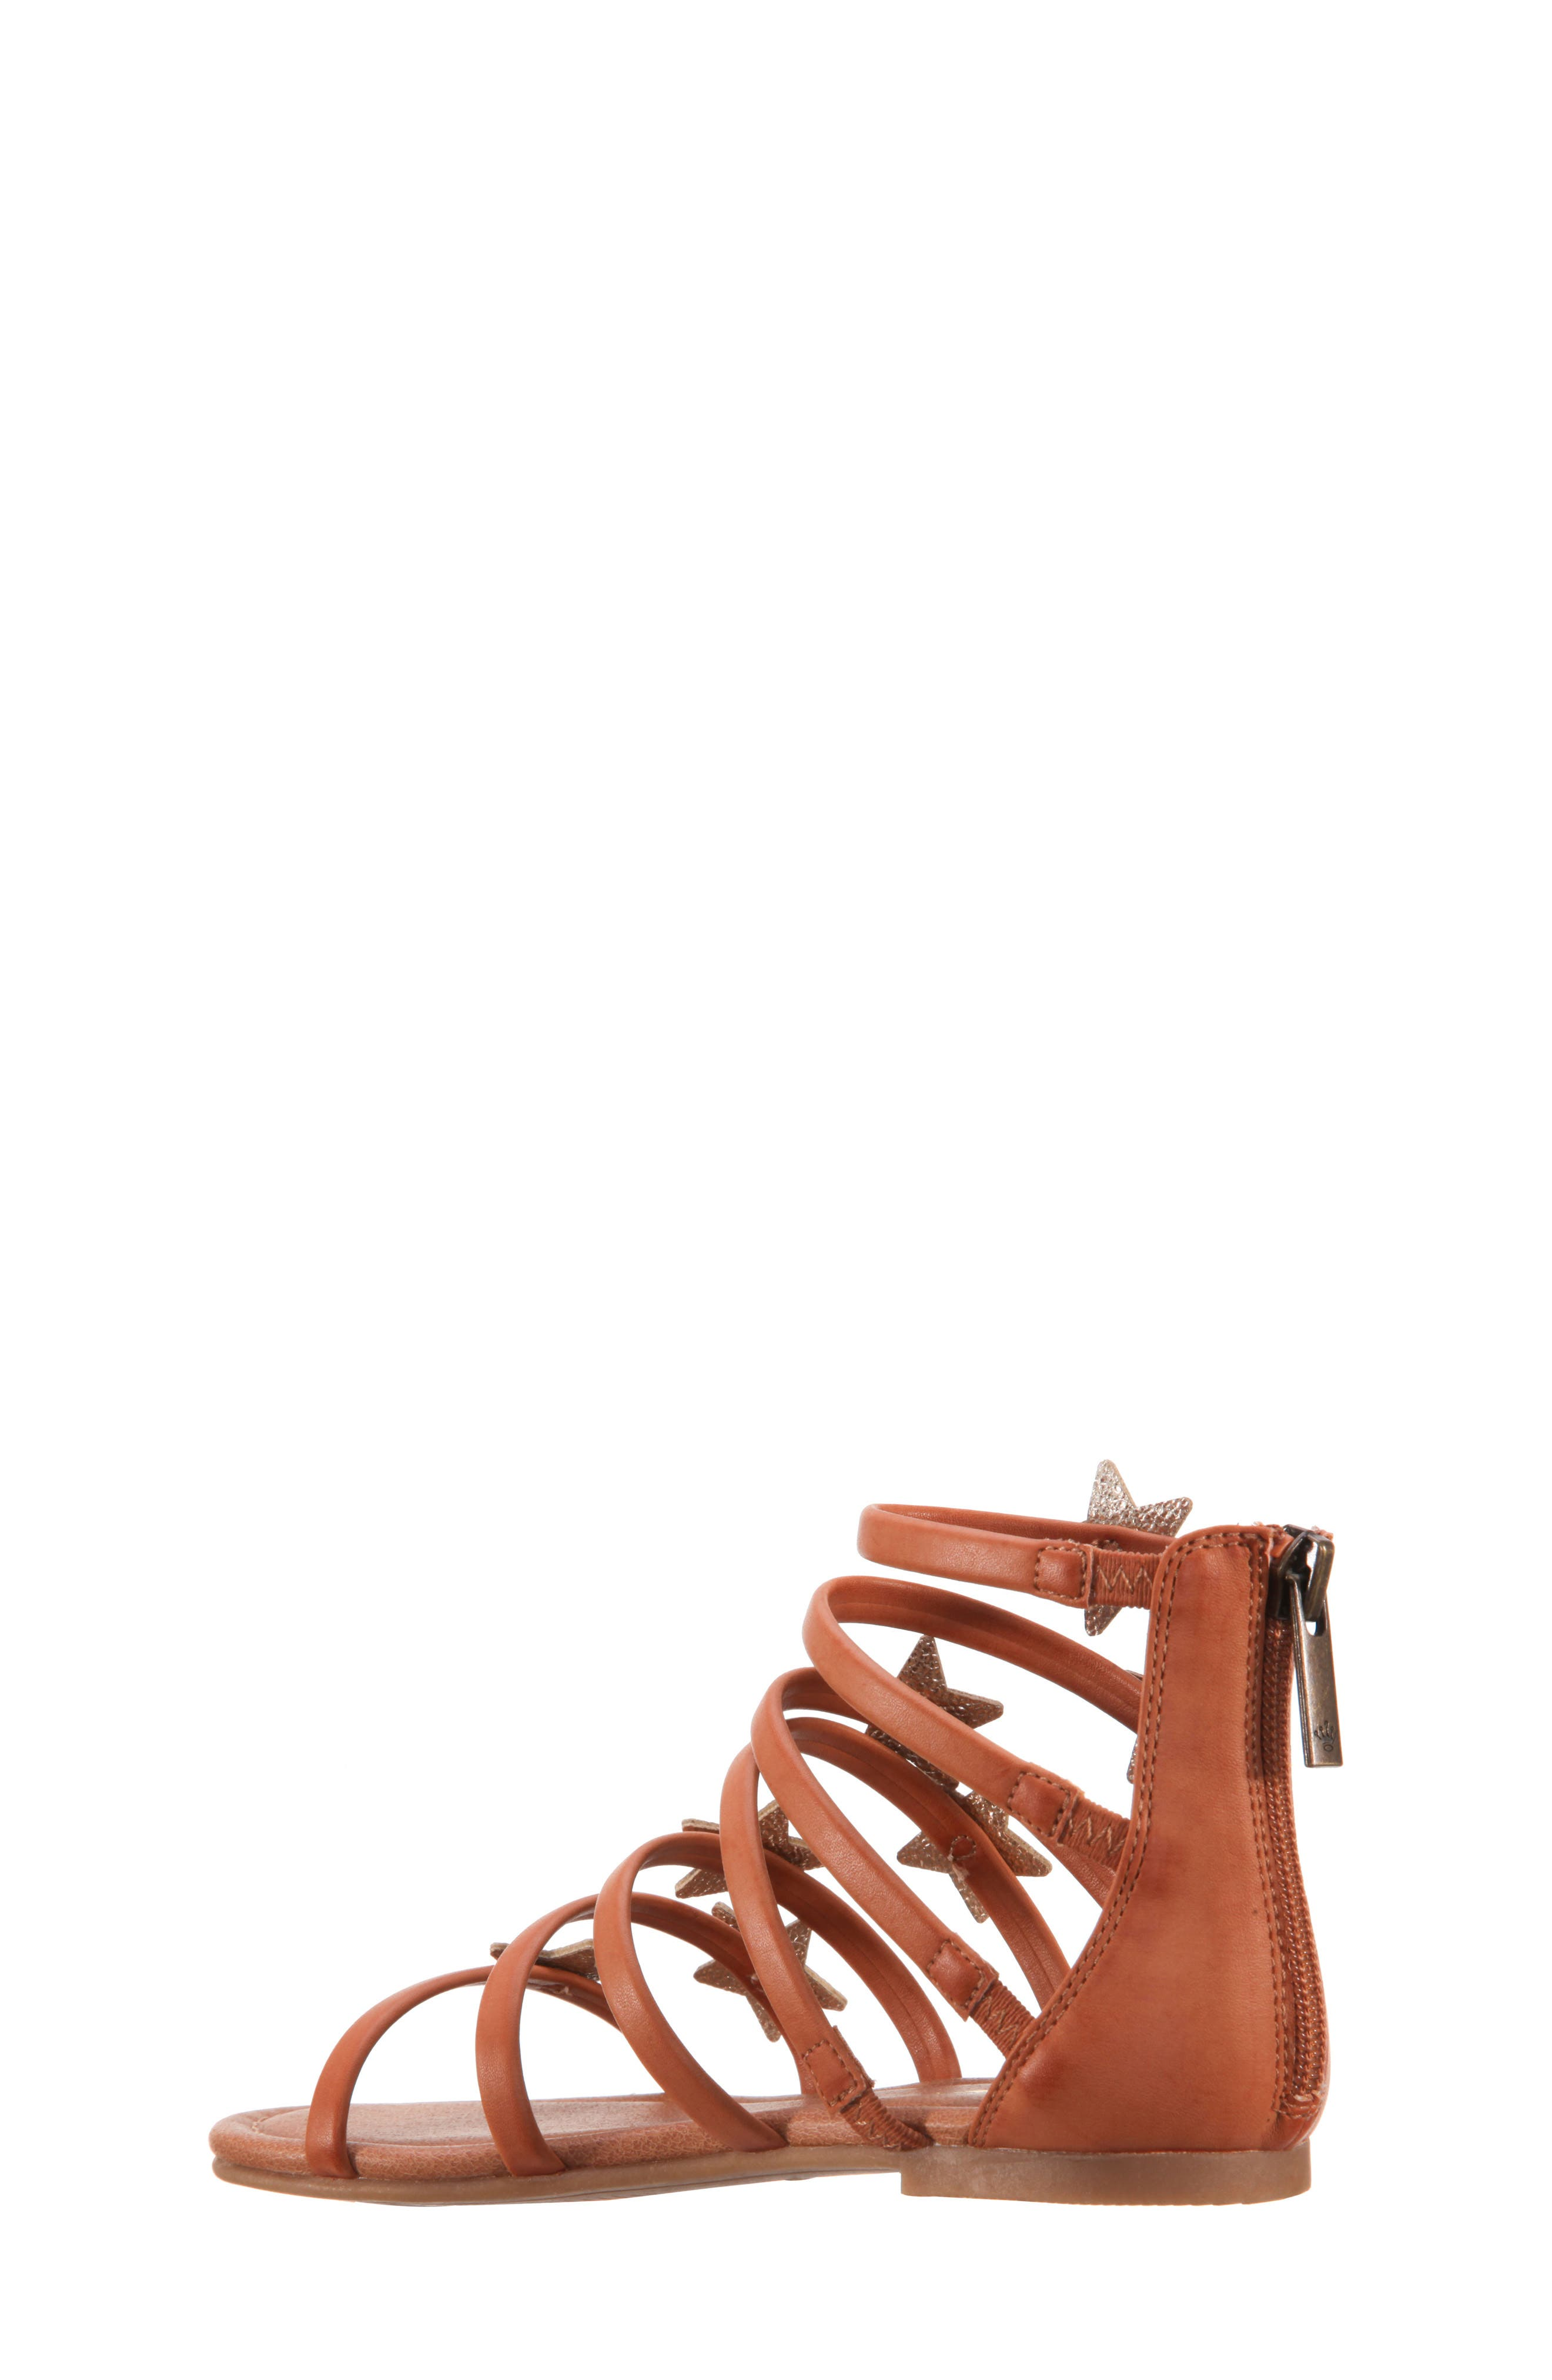 Robertha Gladiator Sandal,                             Alternate thumbnail 2, color,                             Tan Smooth/ Gold Metallic